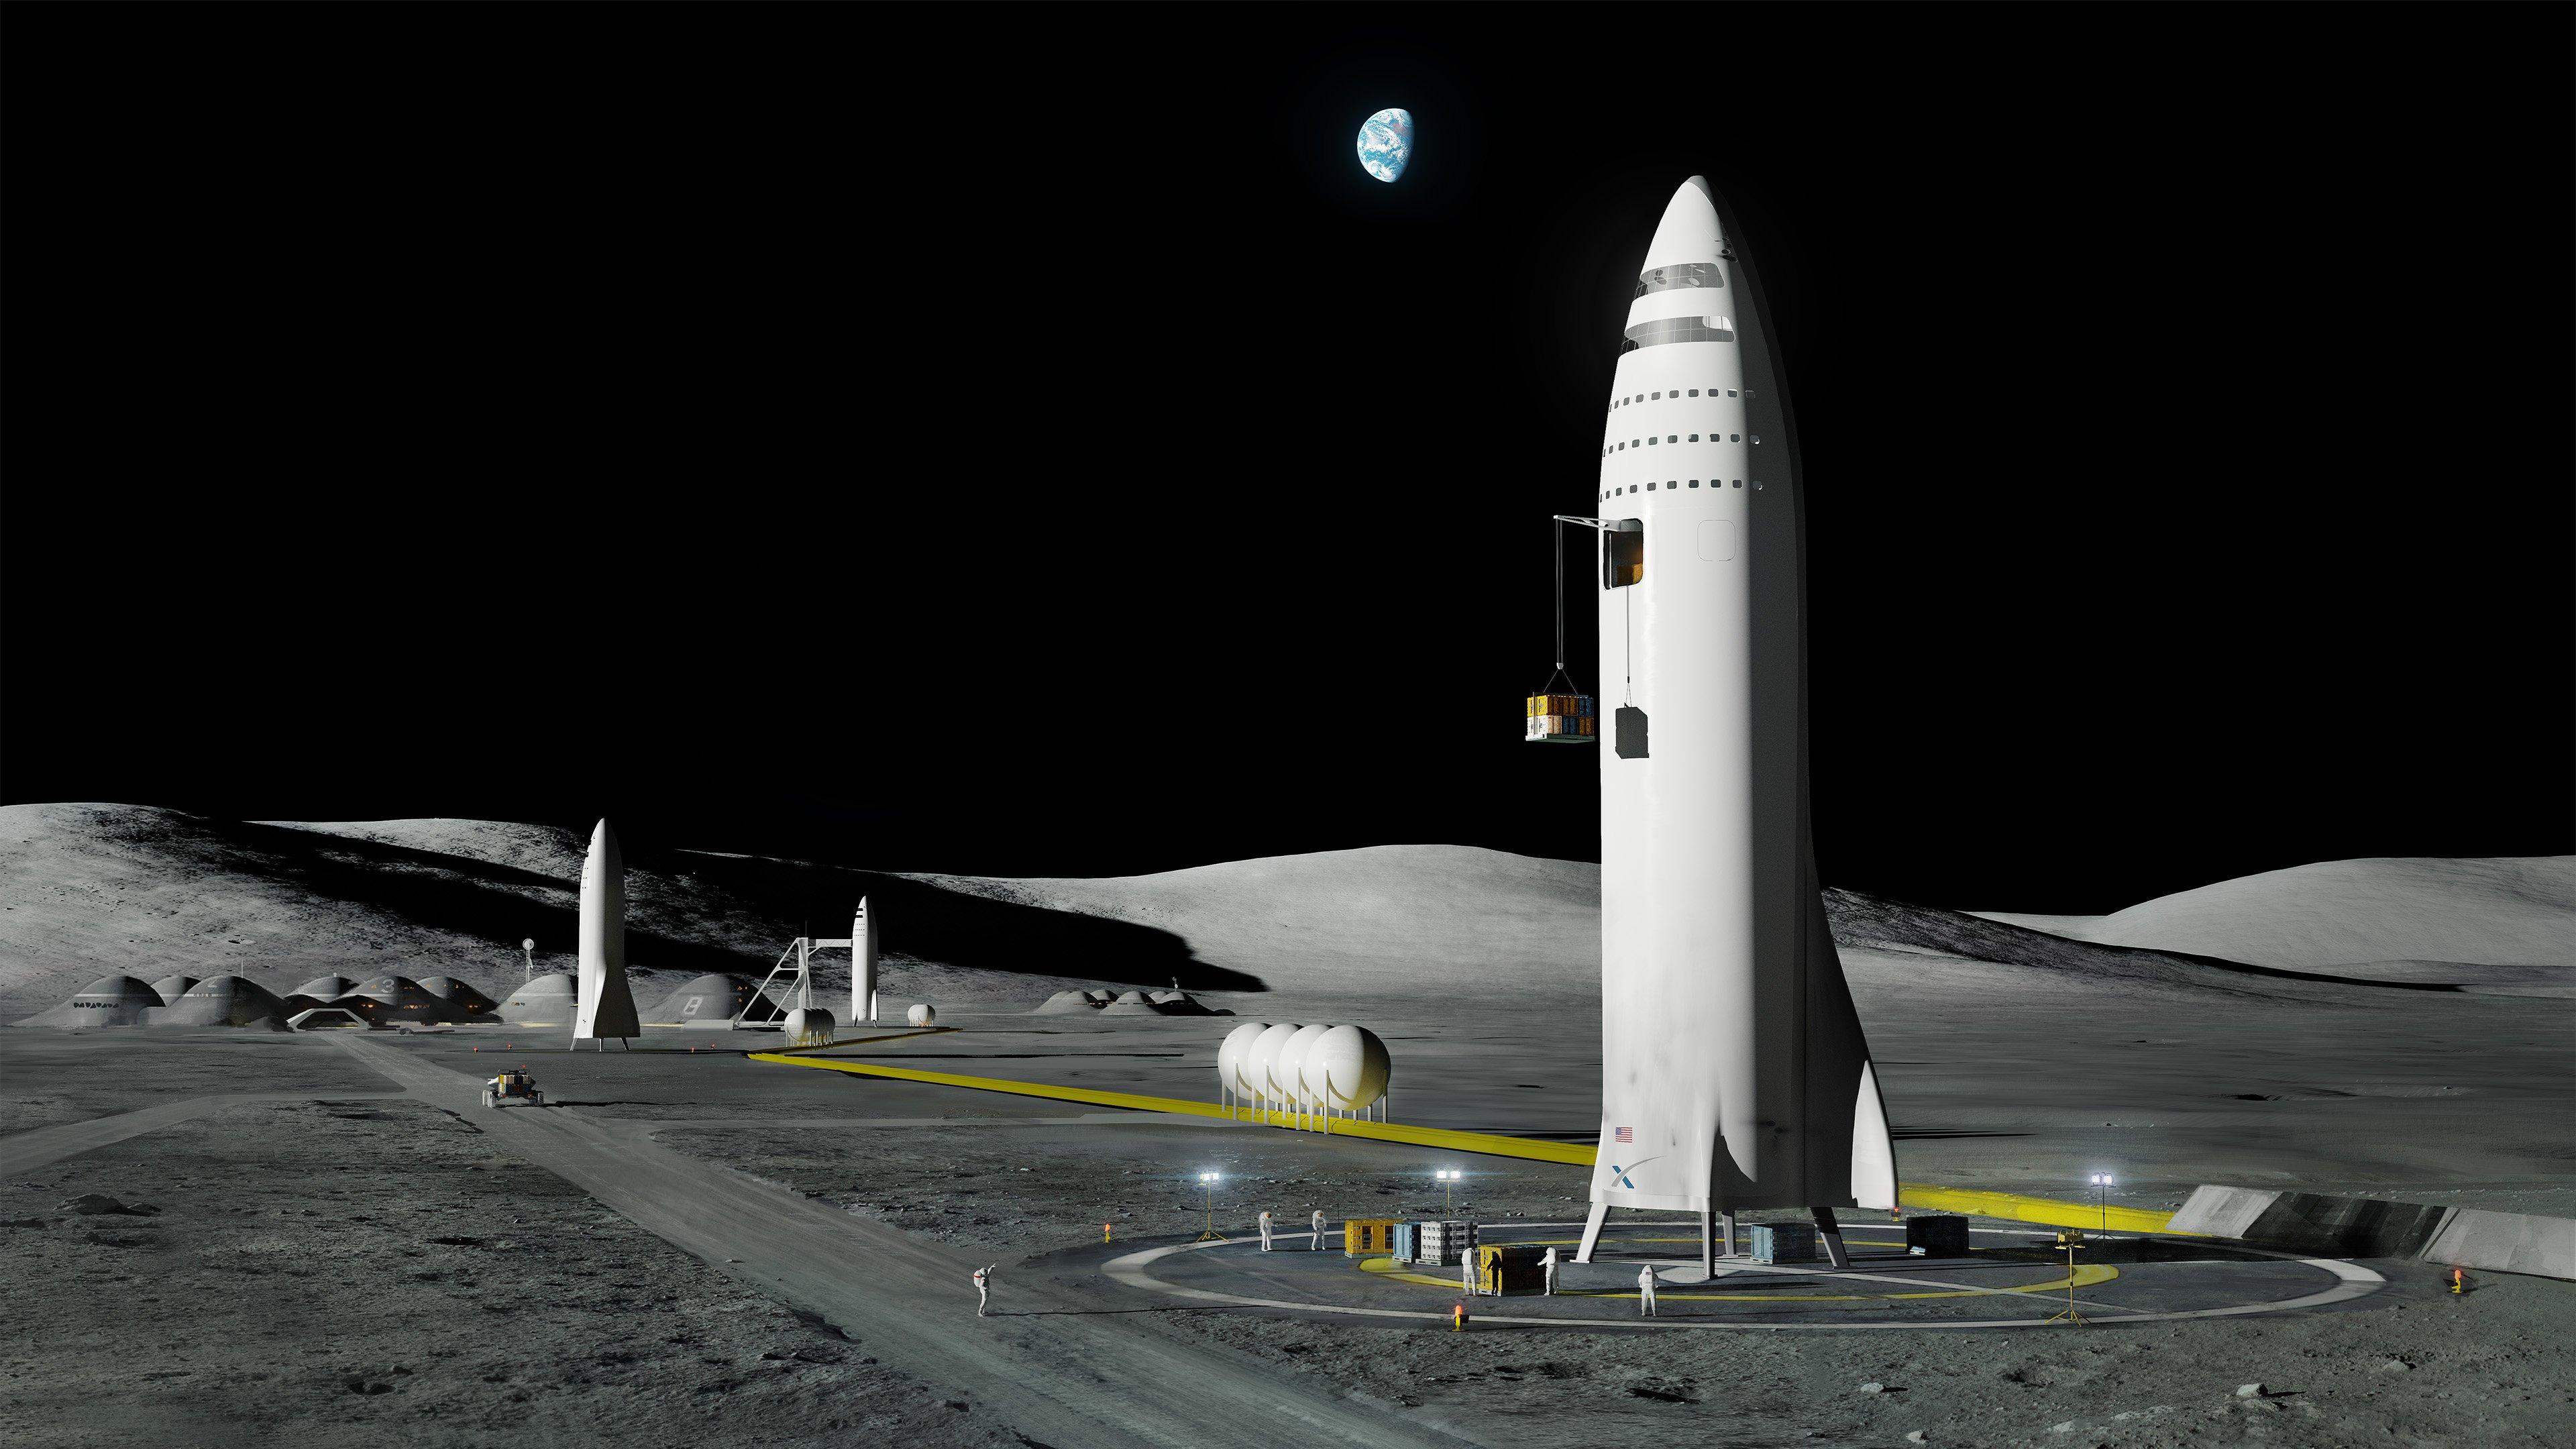 https://cdn.teslarati.com/wp-content/uploads/2017/09/SpaceX-Moon-Base-SpaceX.jpg